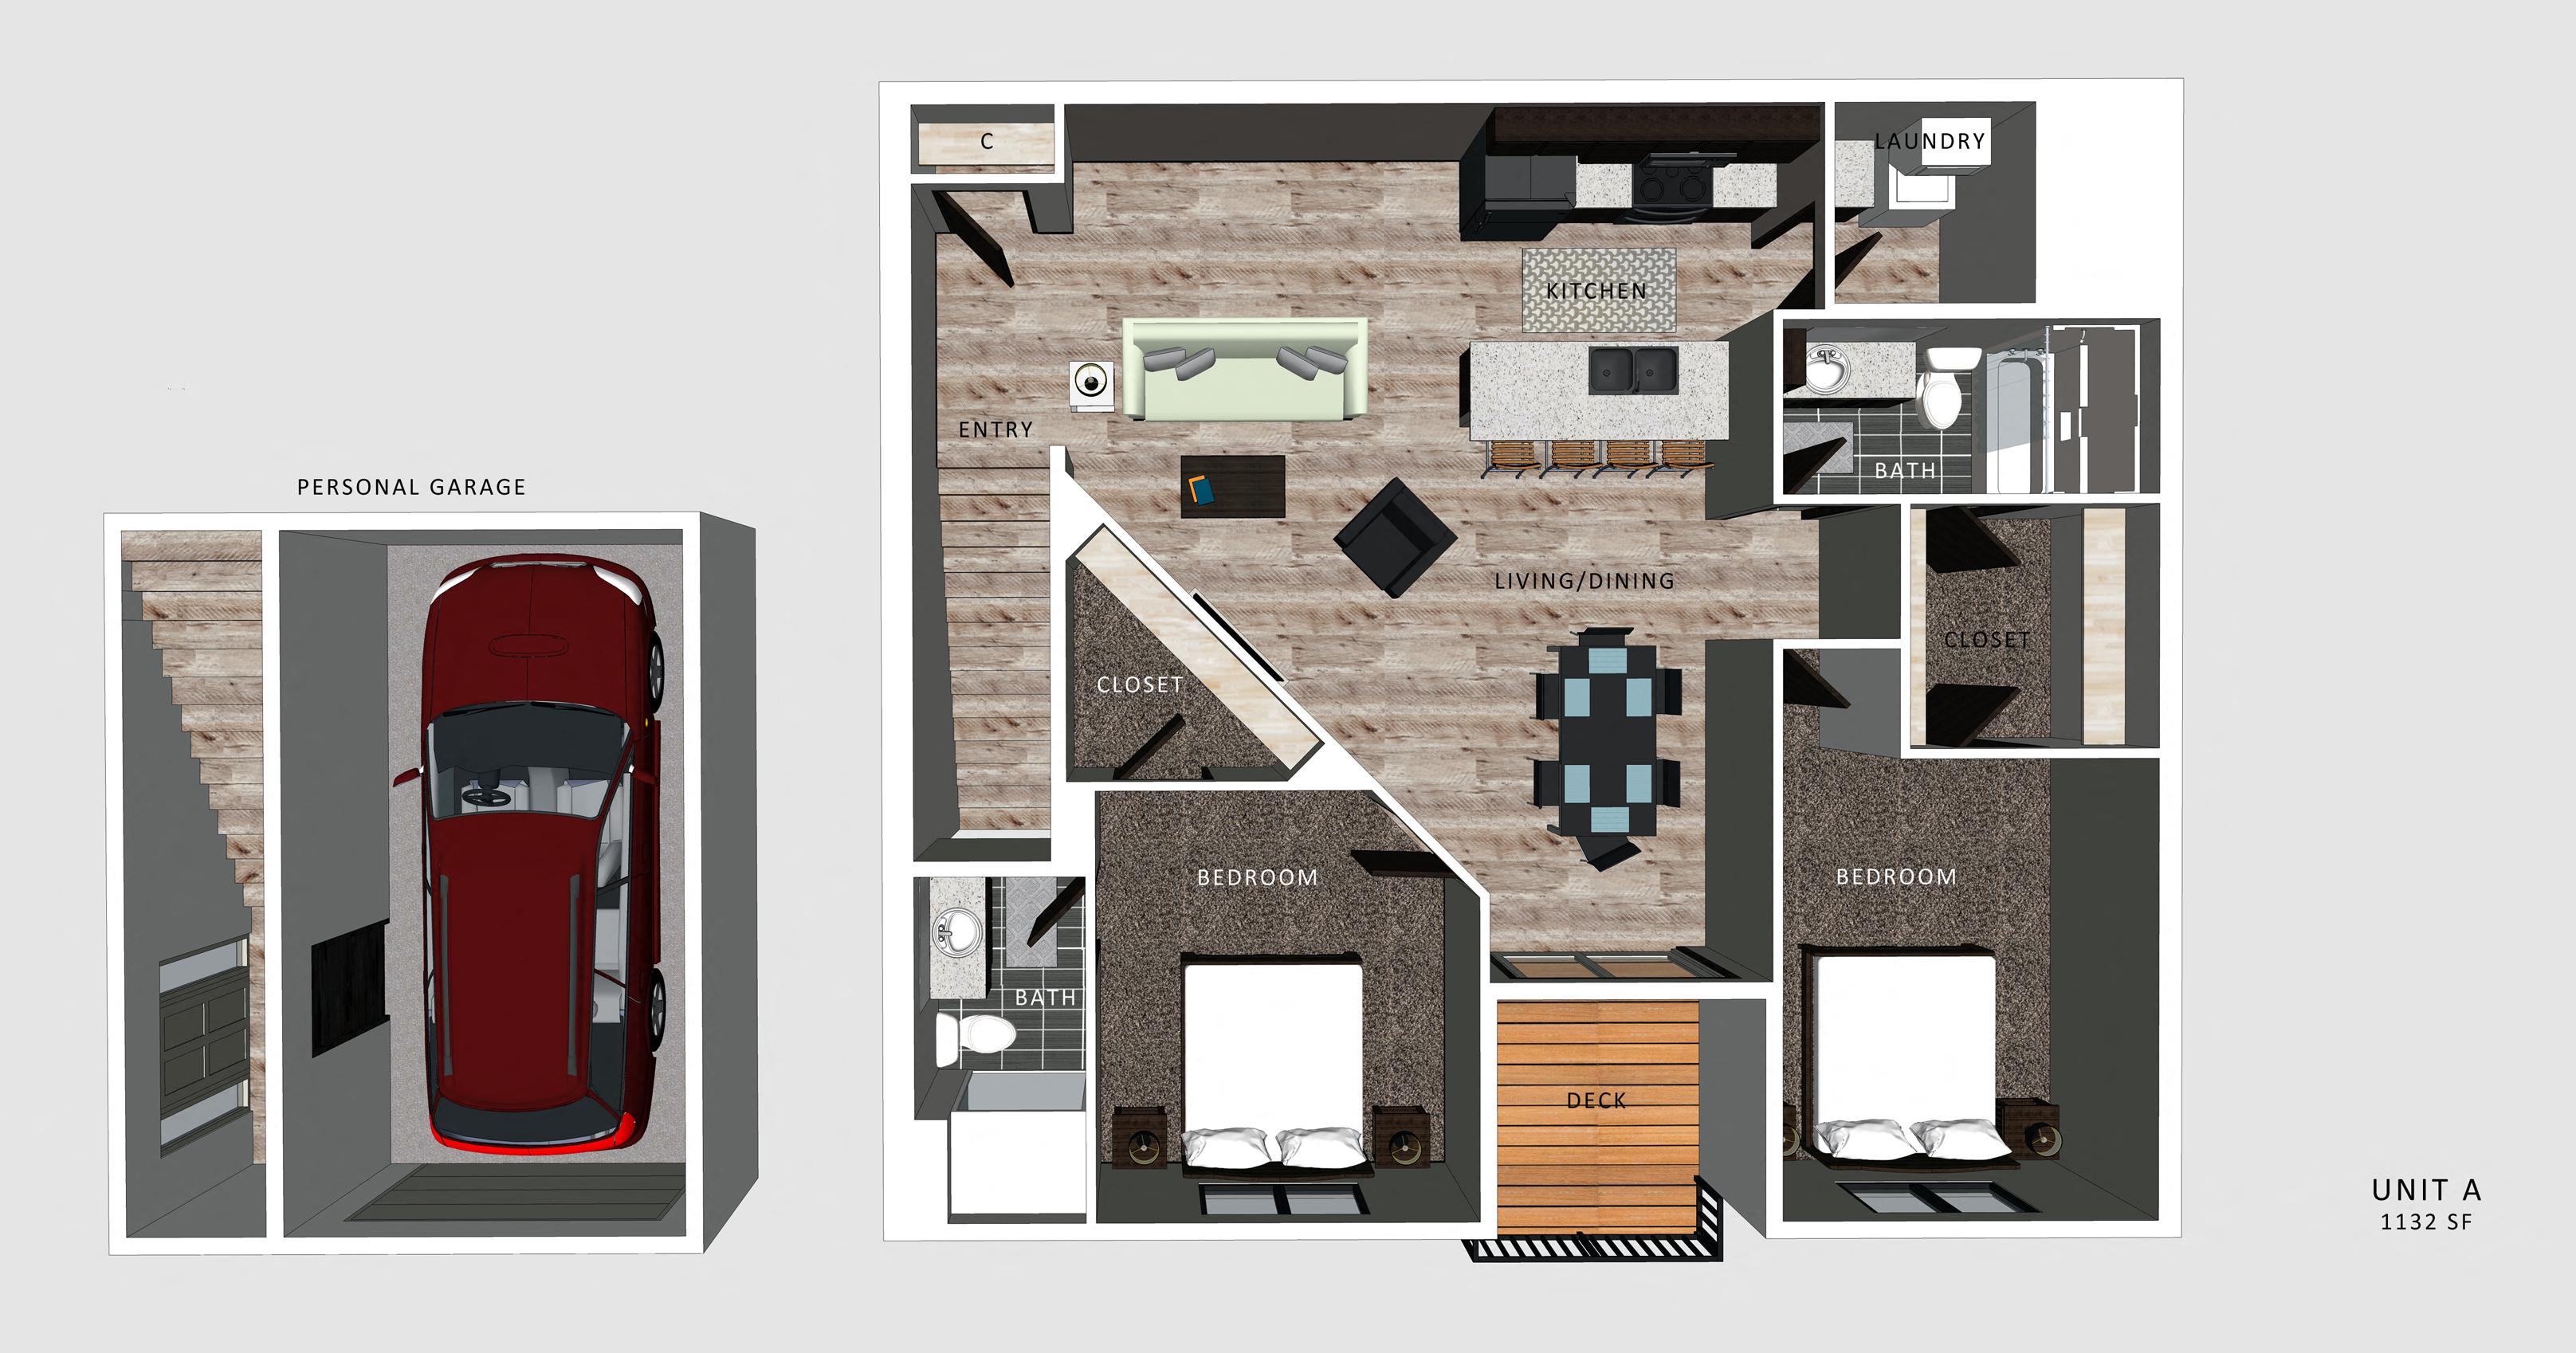 com ne brookside rent at lincoln apartments apartment brooksidelincoln watch for fallbrook